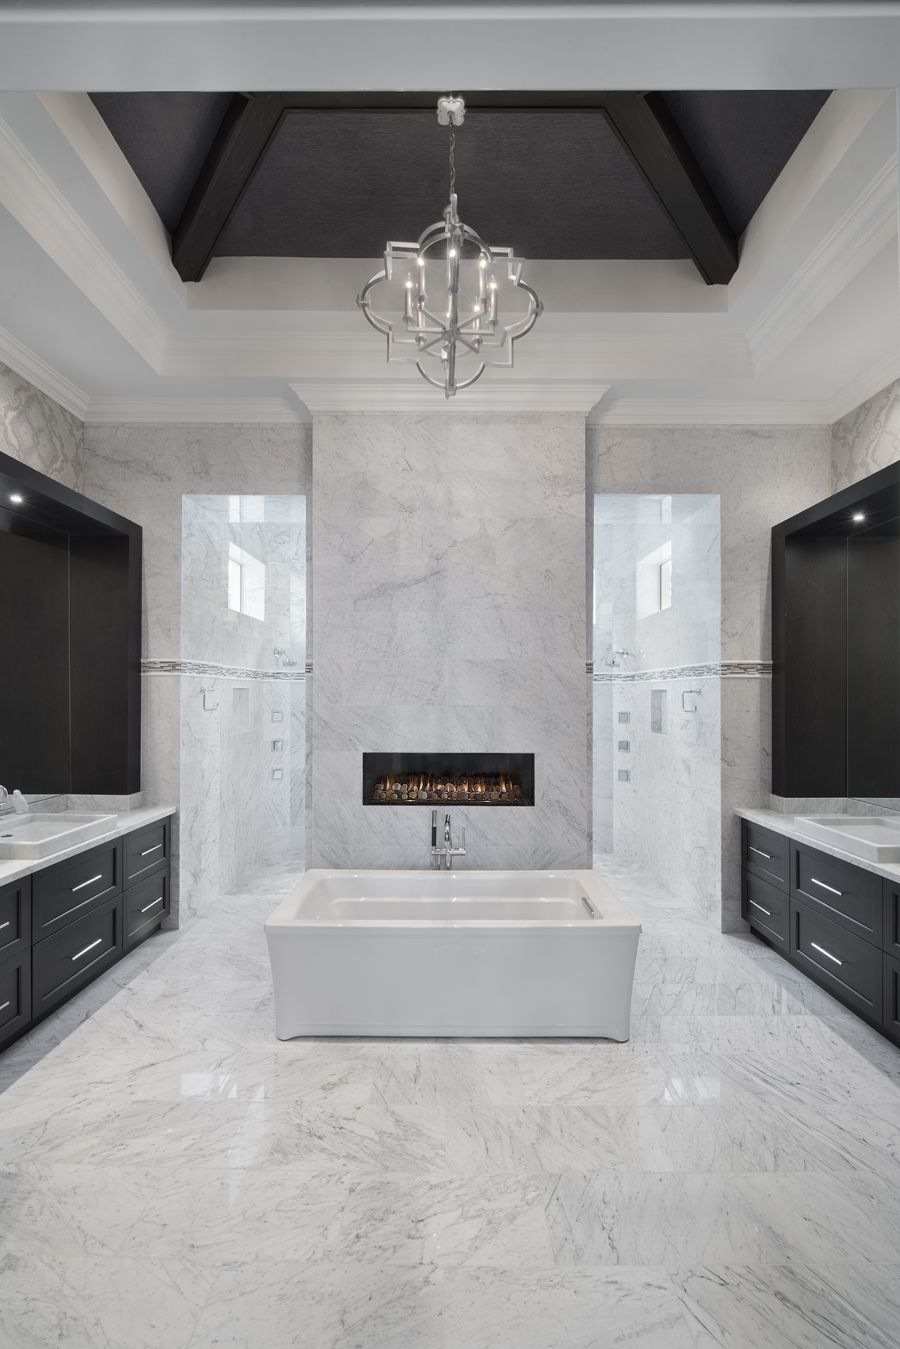 Top Bathroom Decor Trends 2016 | Bath, Spaces and Faucet